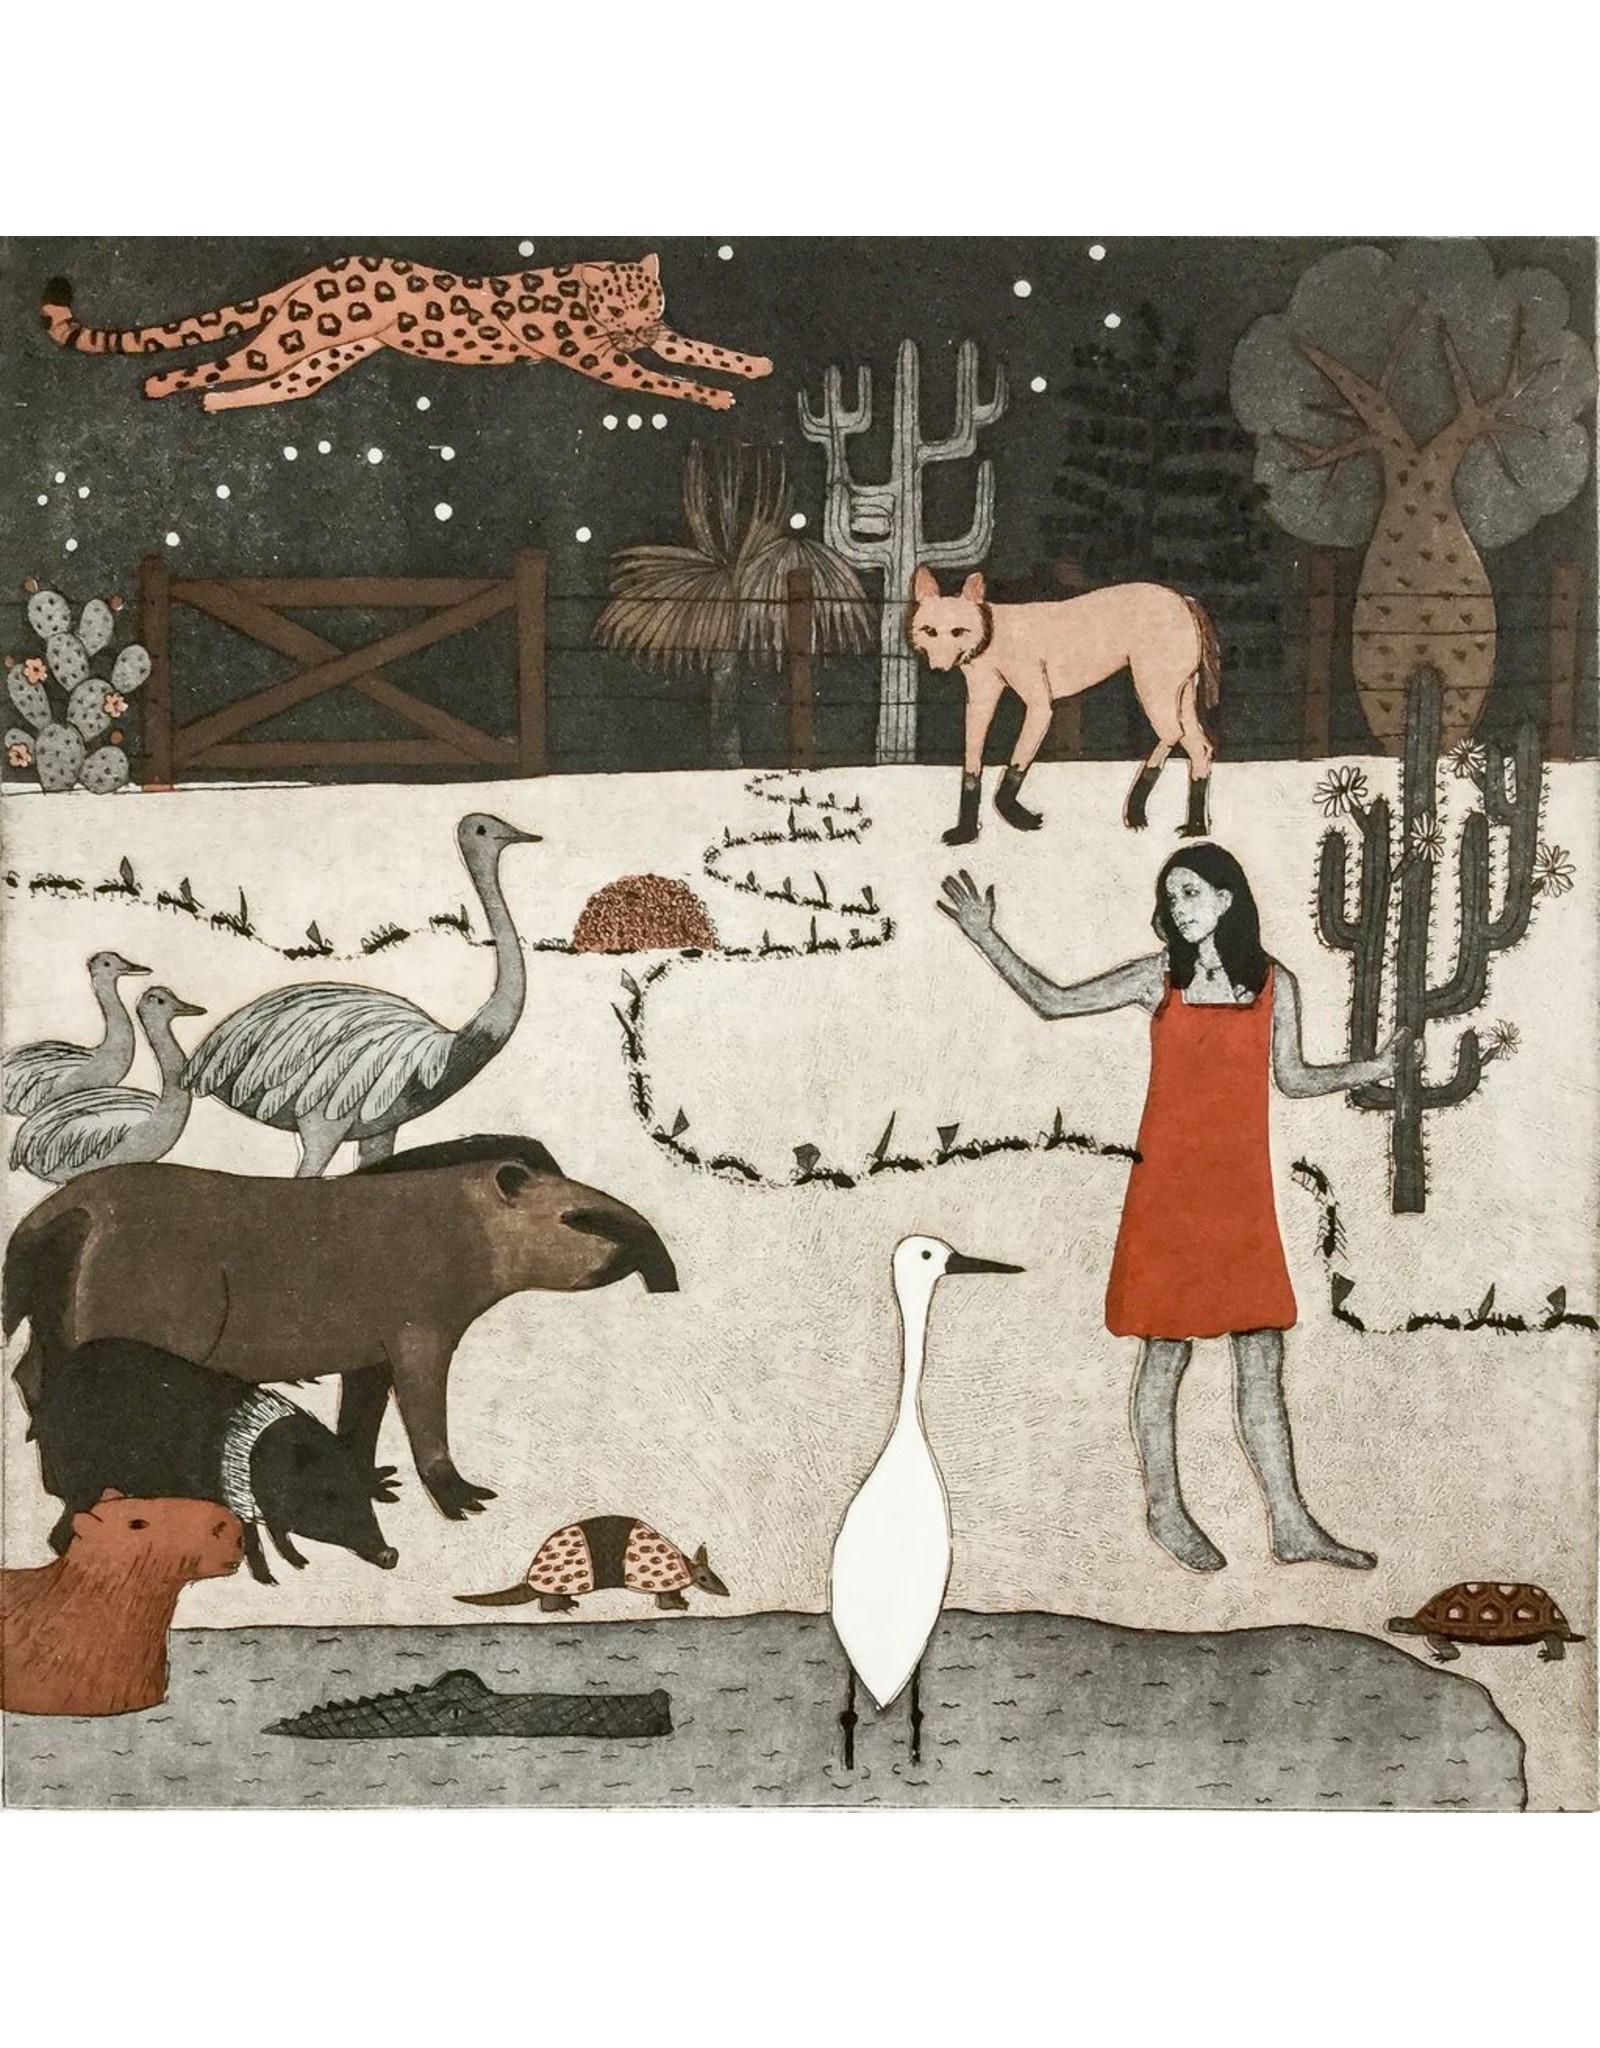 Rudolph, Miriam Farewell to Montkamp